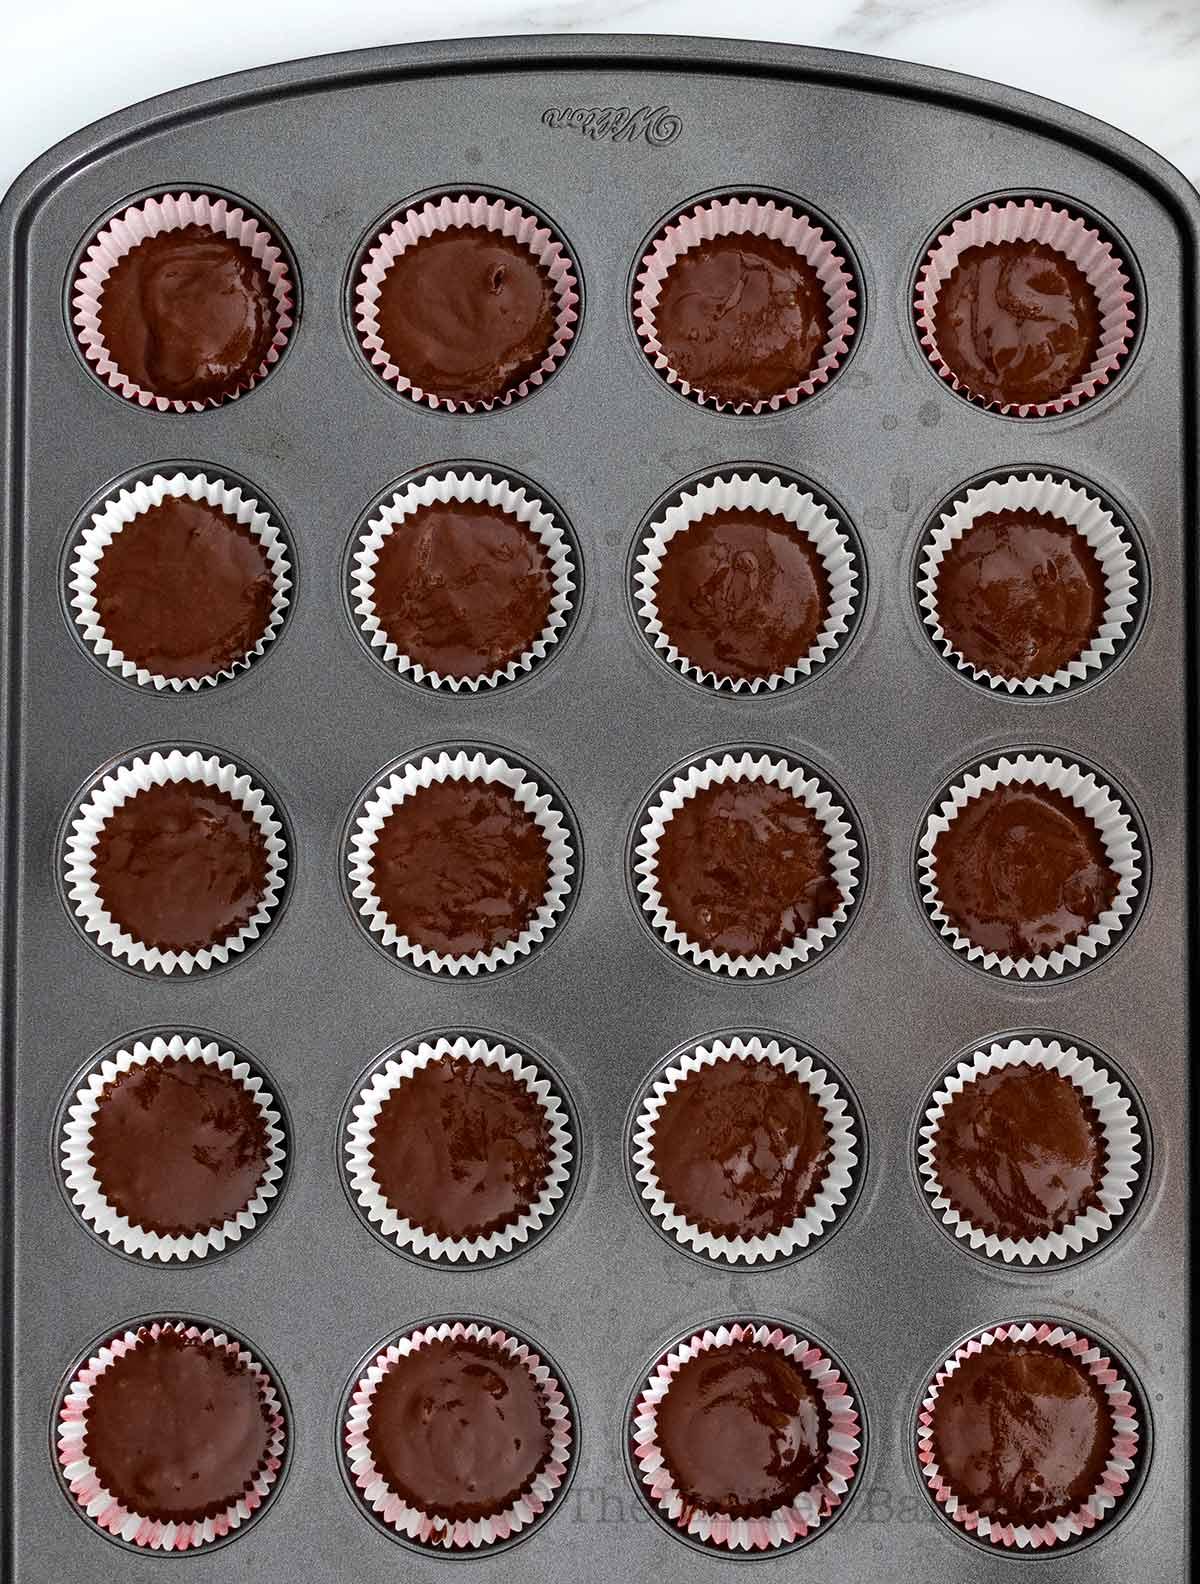 Transfer chocolate batter to pan